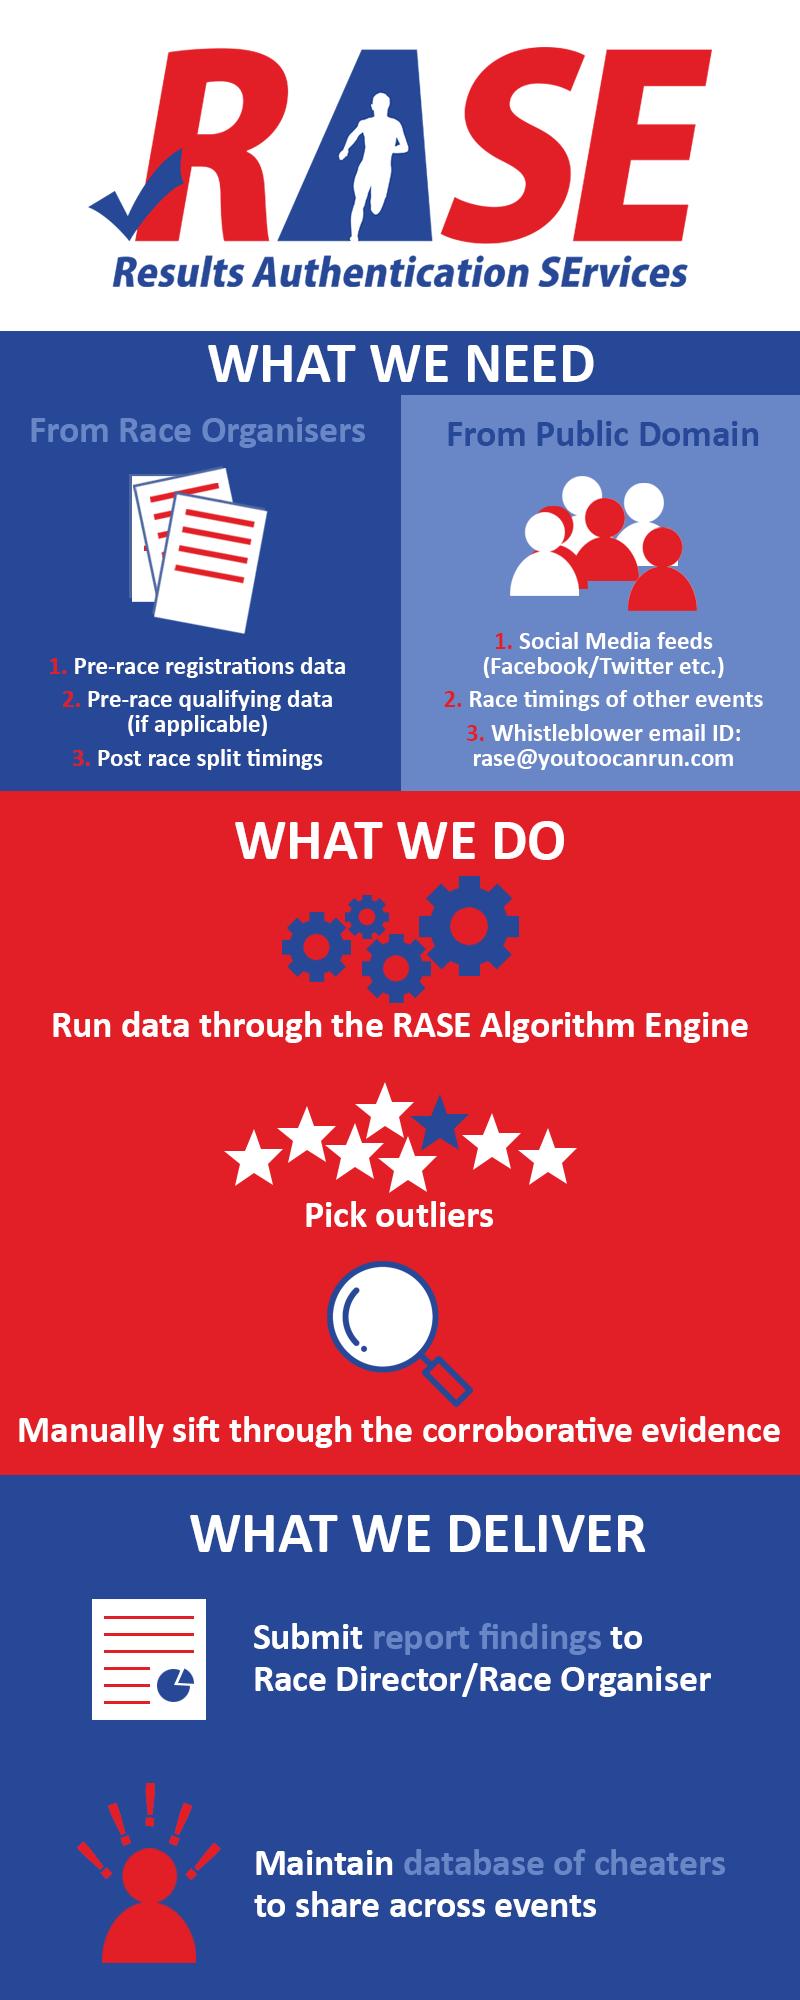 rase_infographic_v01c (2)